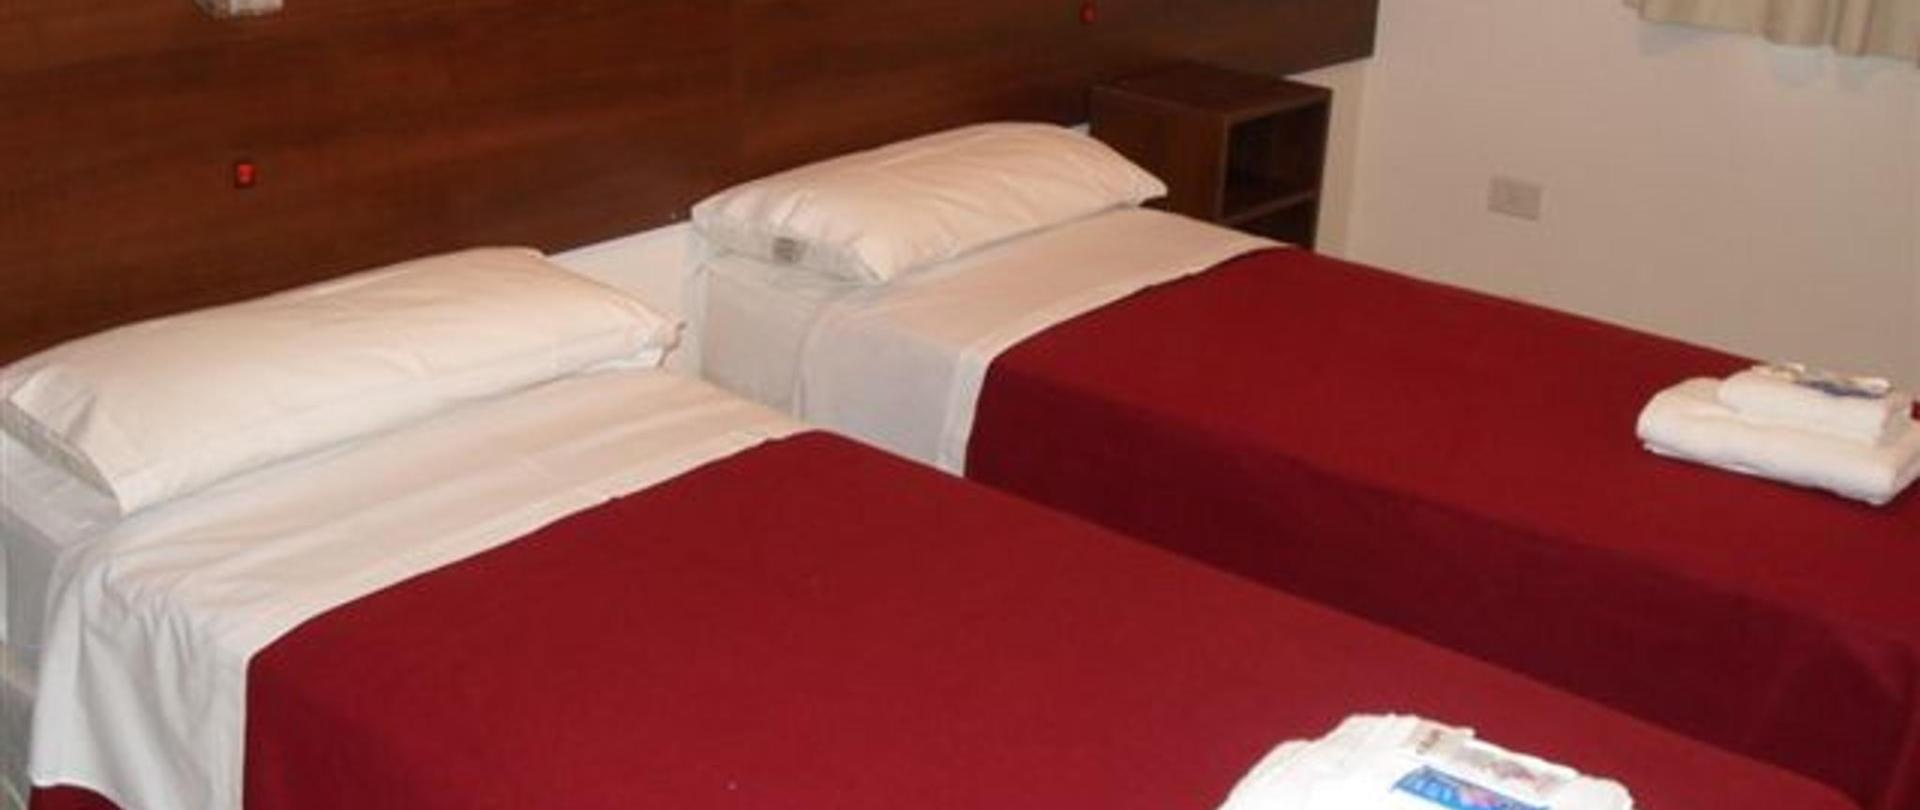 Hotel Queguay habitacion doble twin.jpg